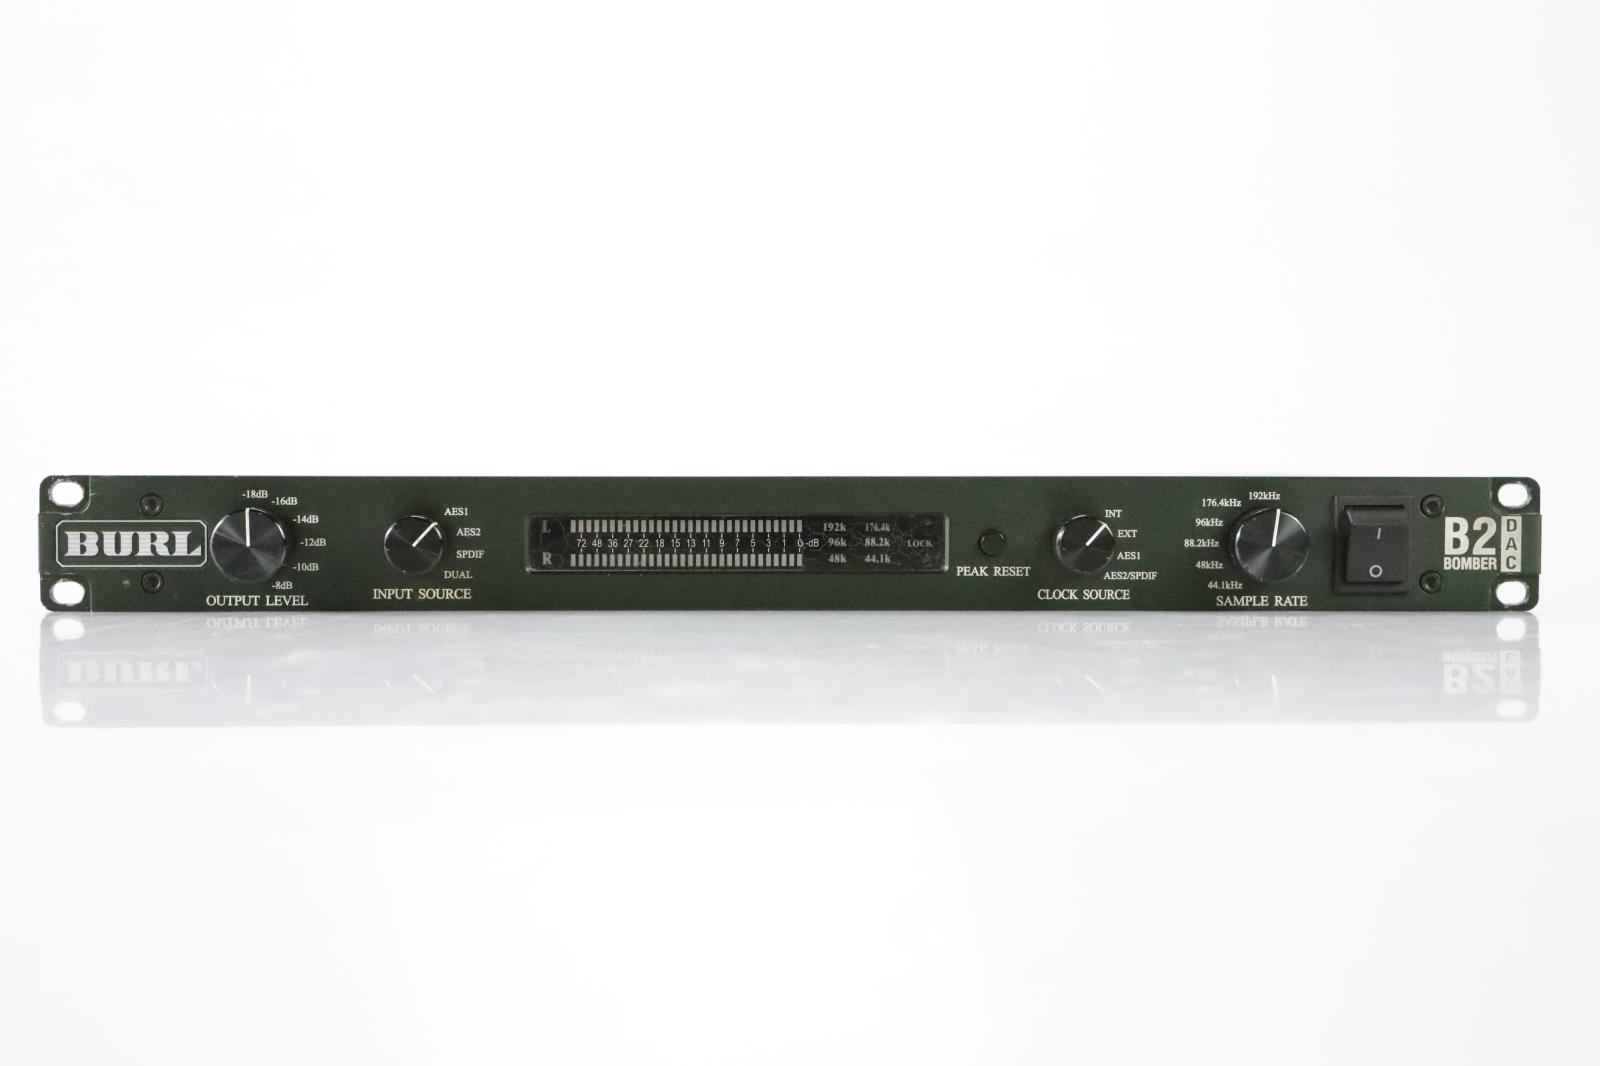 Burl Audio B2 Bomber DAC Two-Channel 192 kHz Digital/Analog Converter #36370